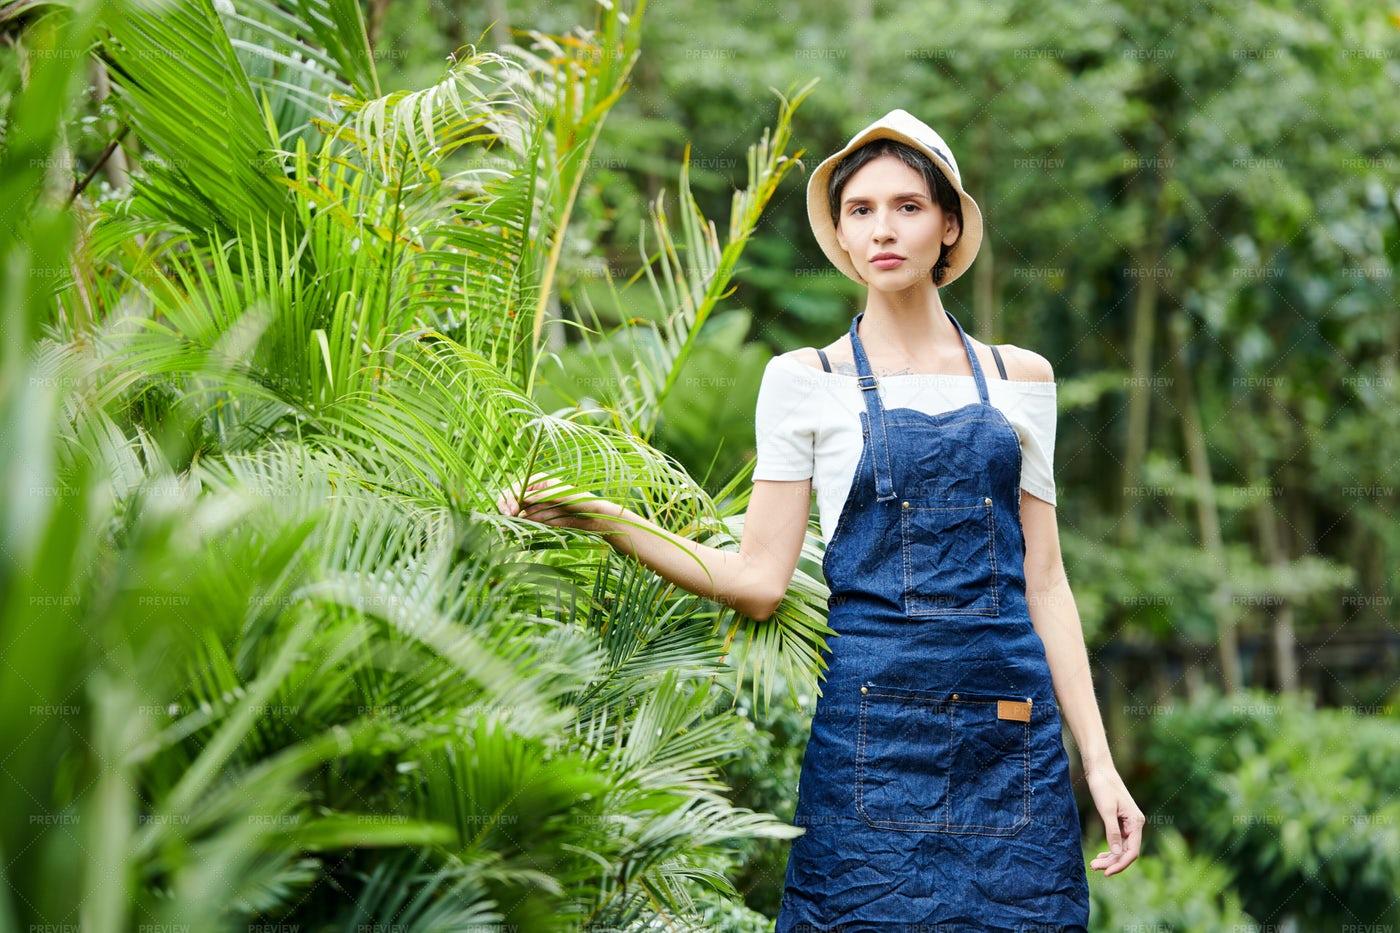 Worker Checking Plans In Garden: Stock Photos